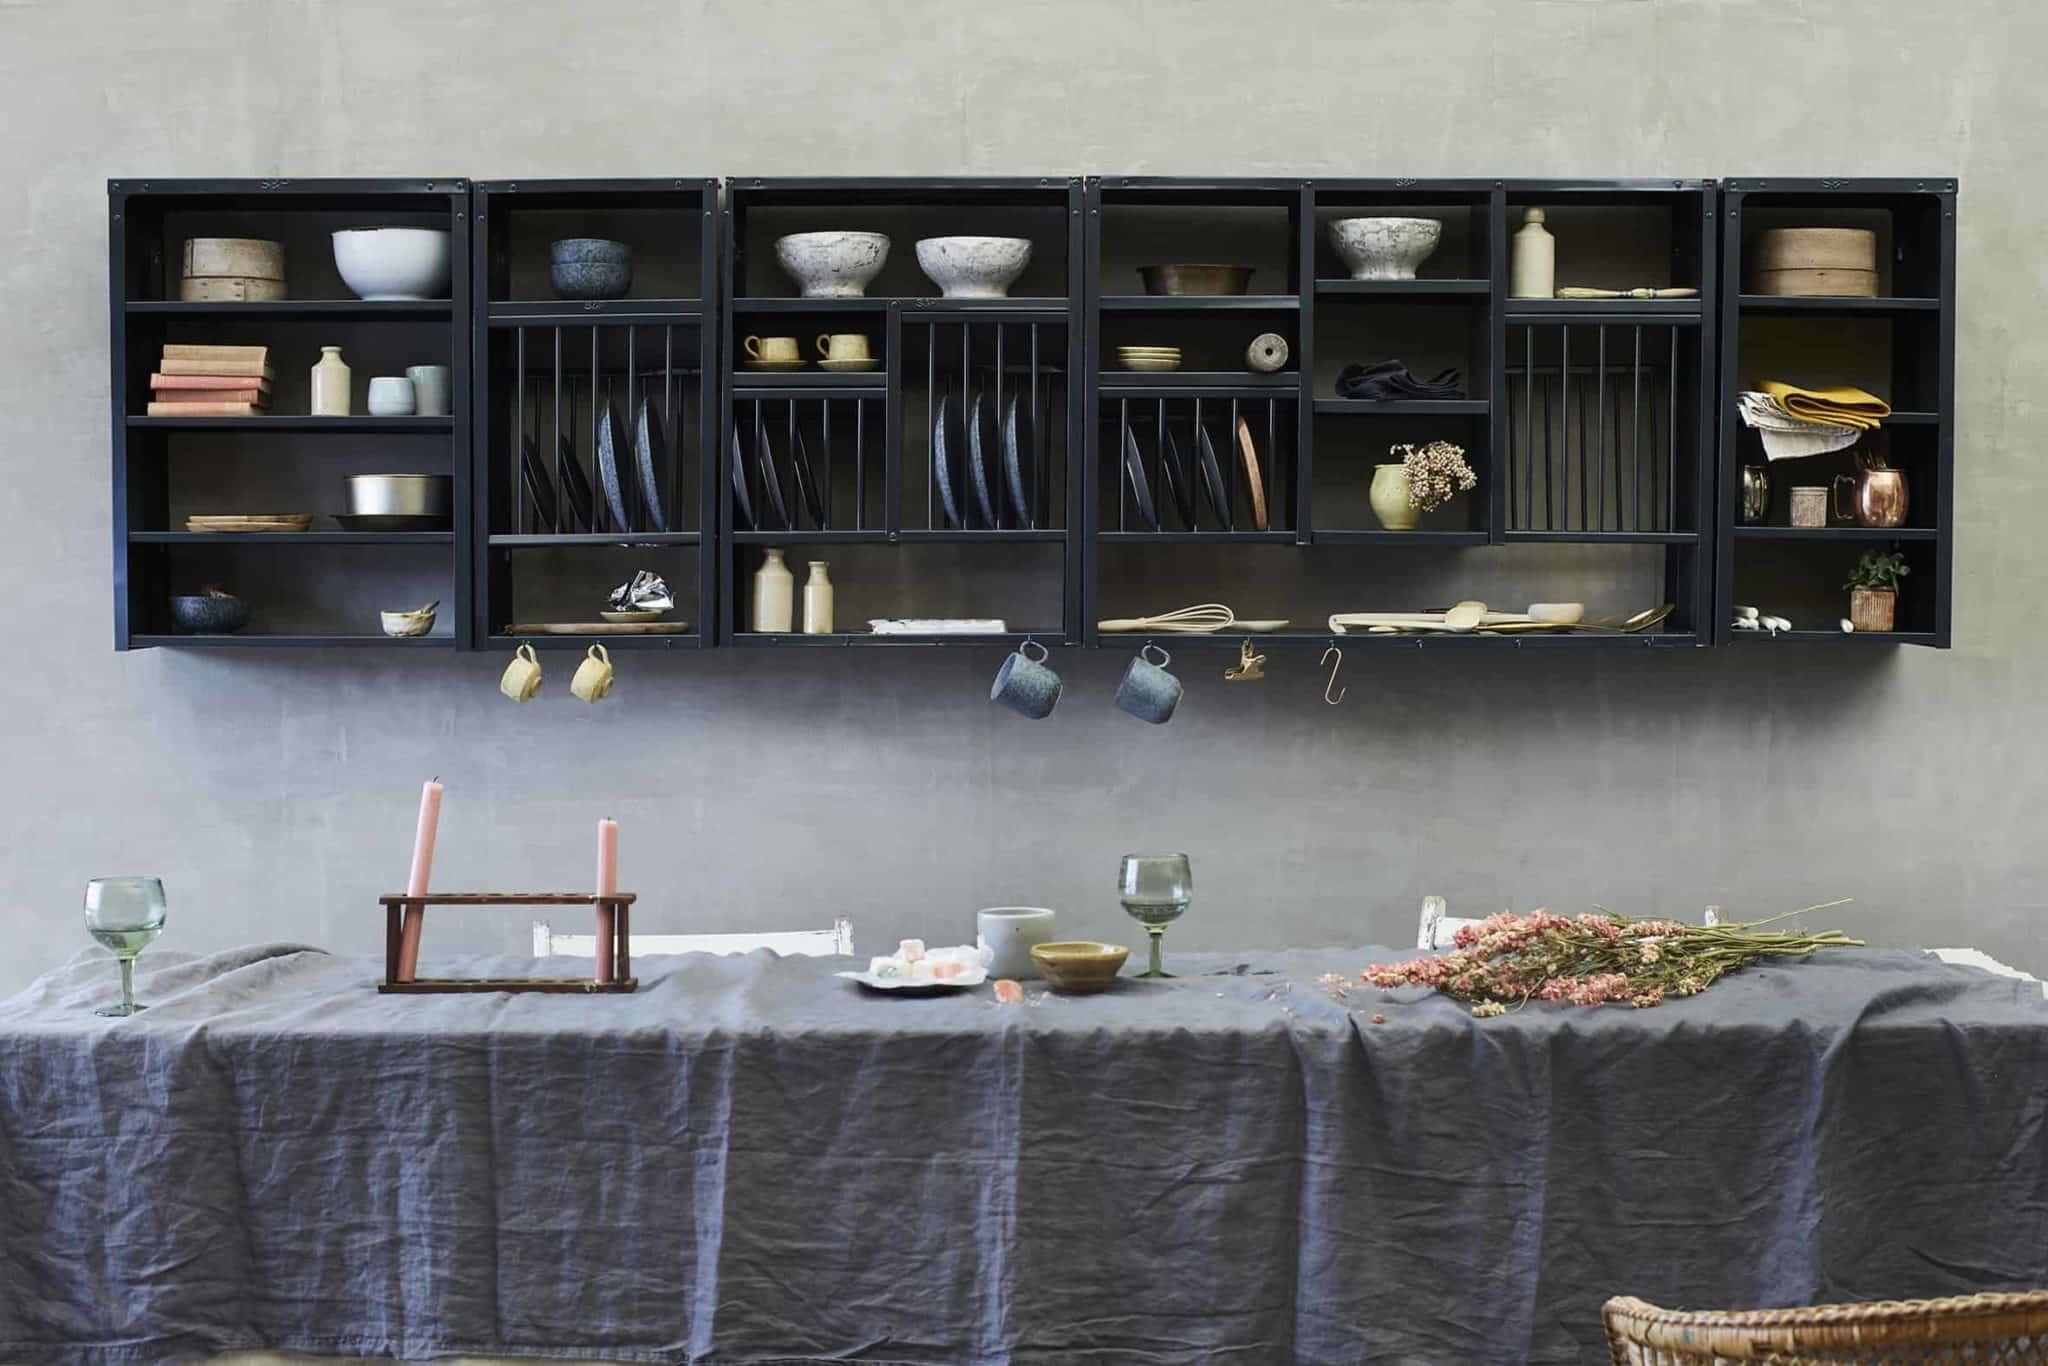 Anthracite Racks and Shelves